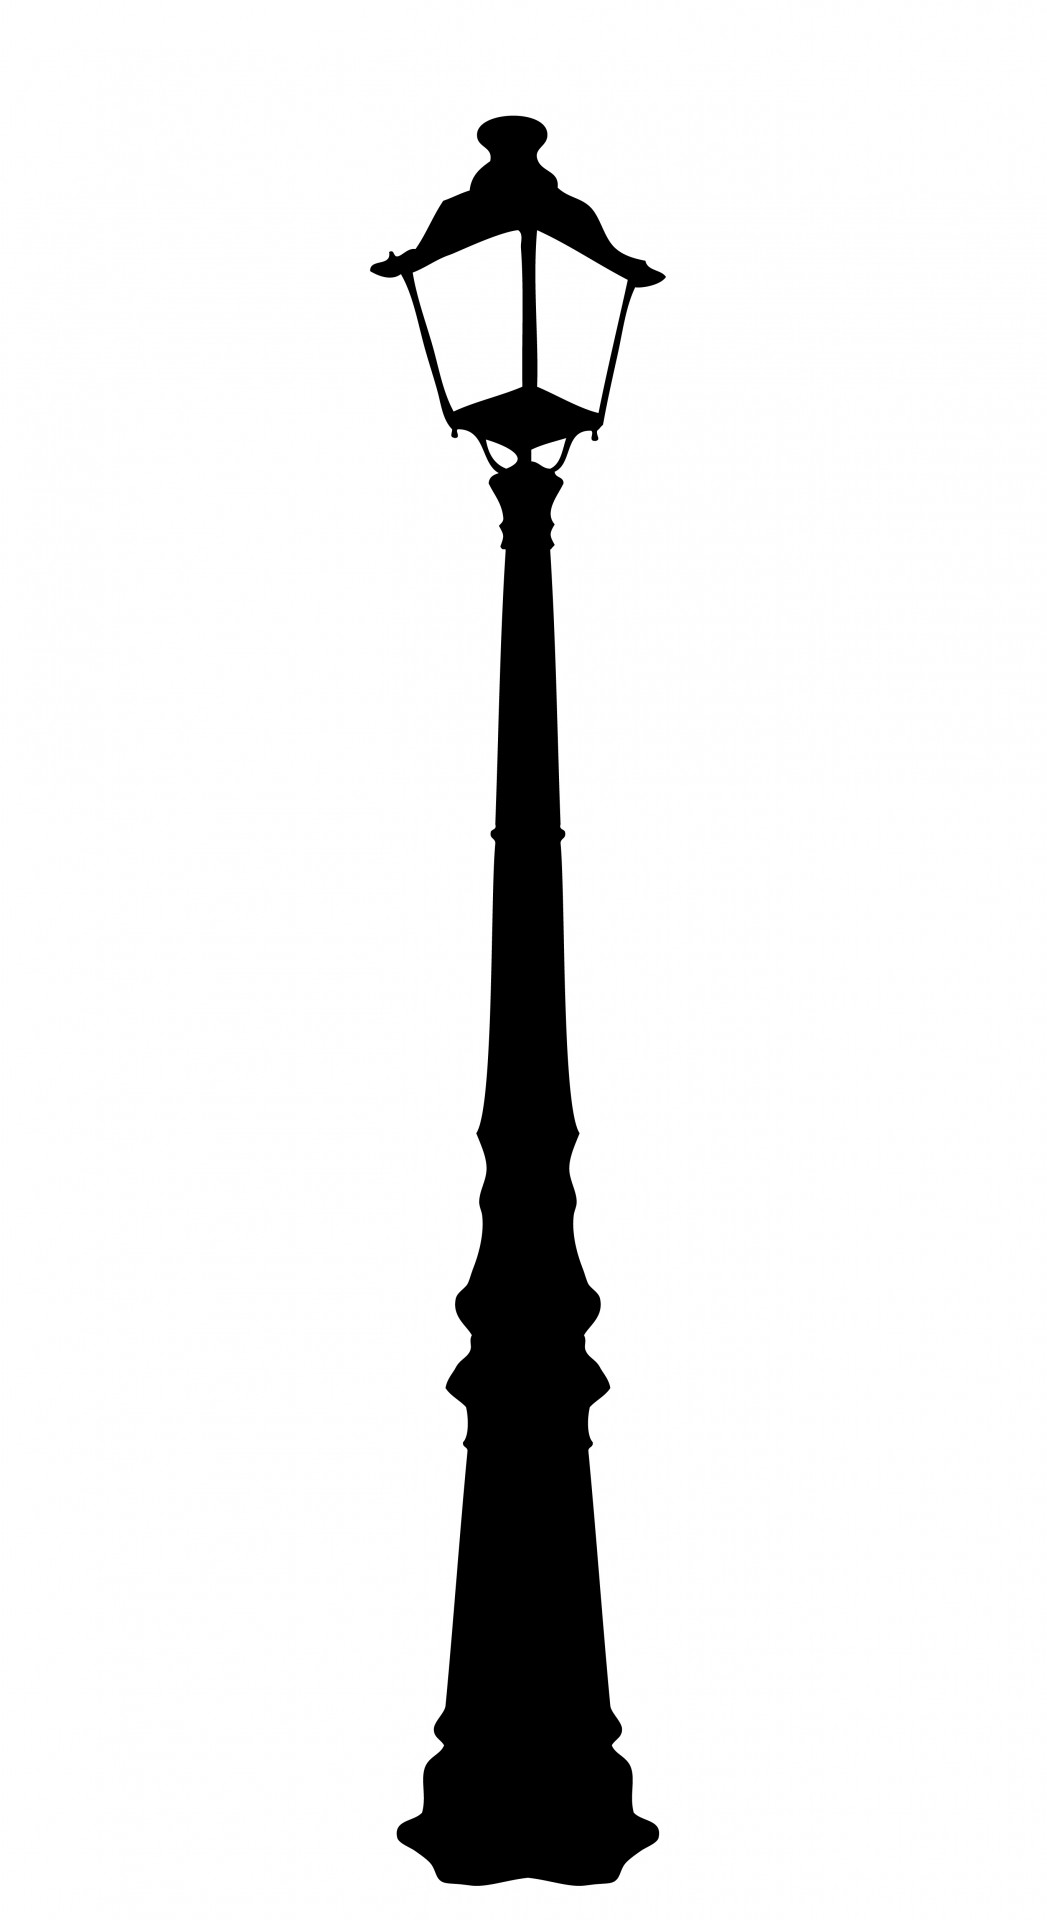 1047x1920 Vintage Street Lamp Clipart Free Stock Photo